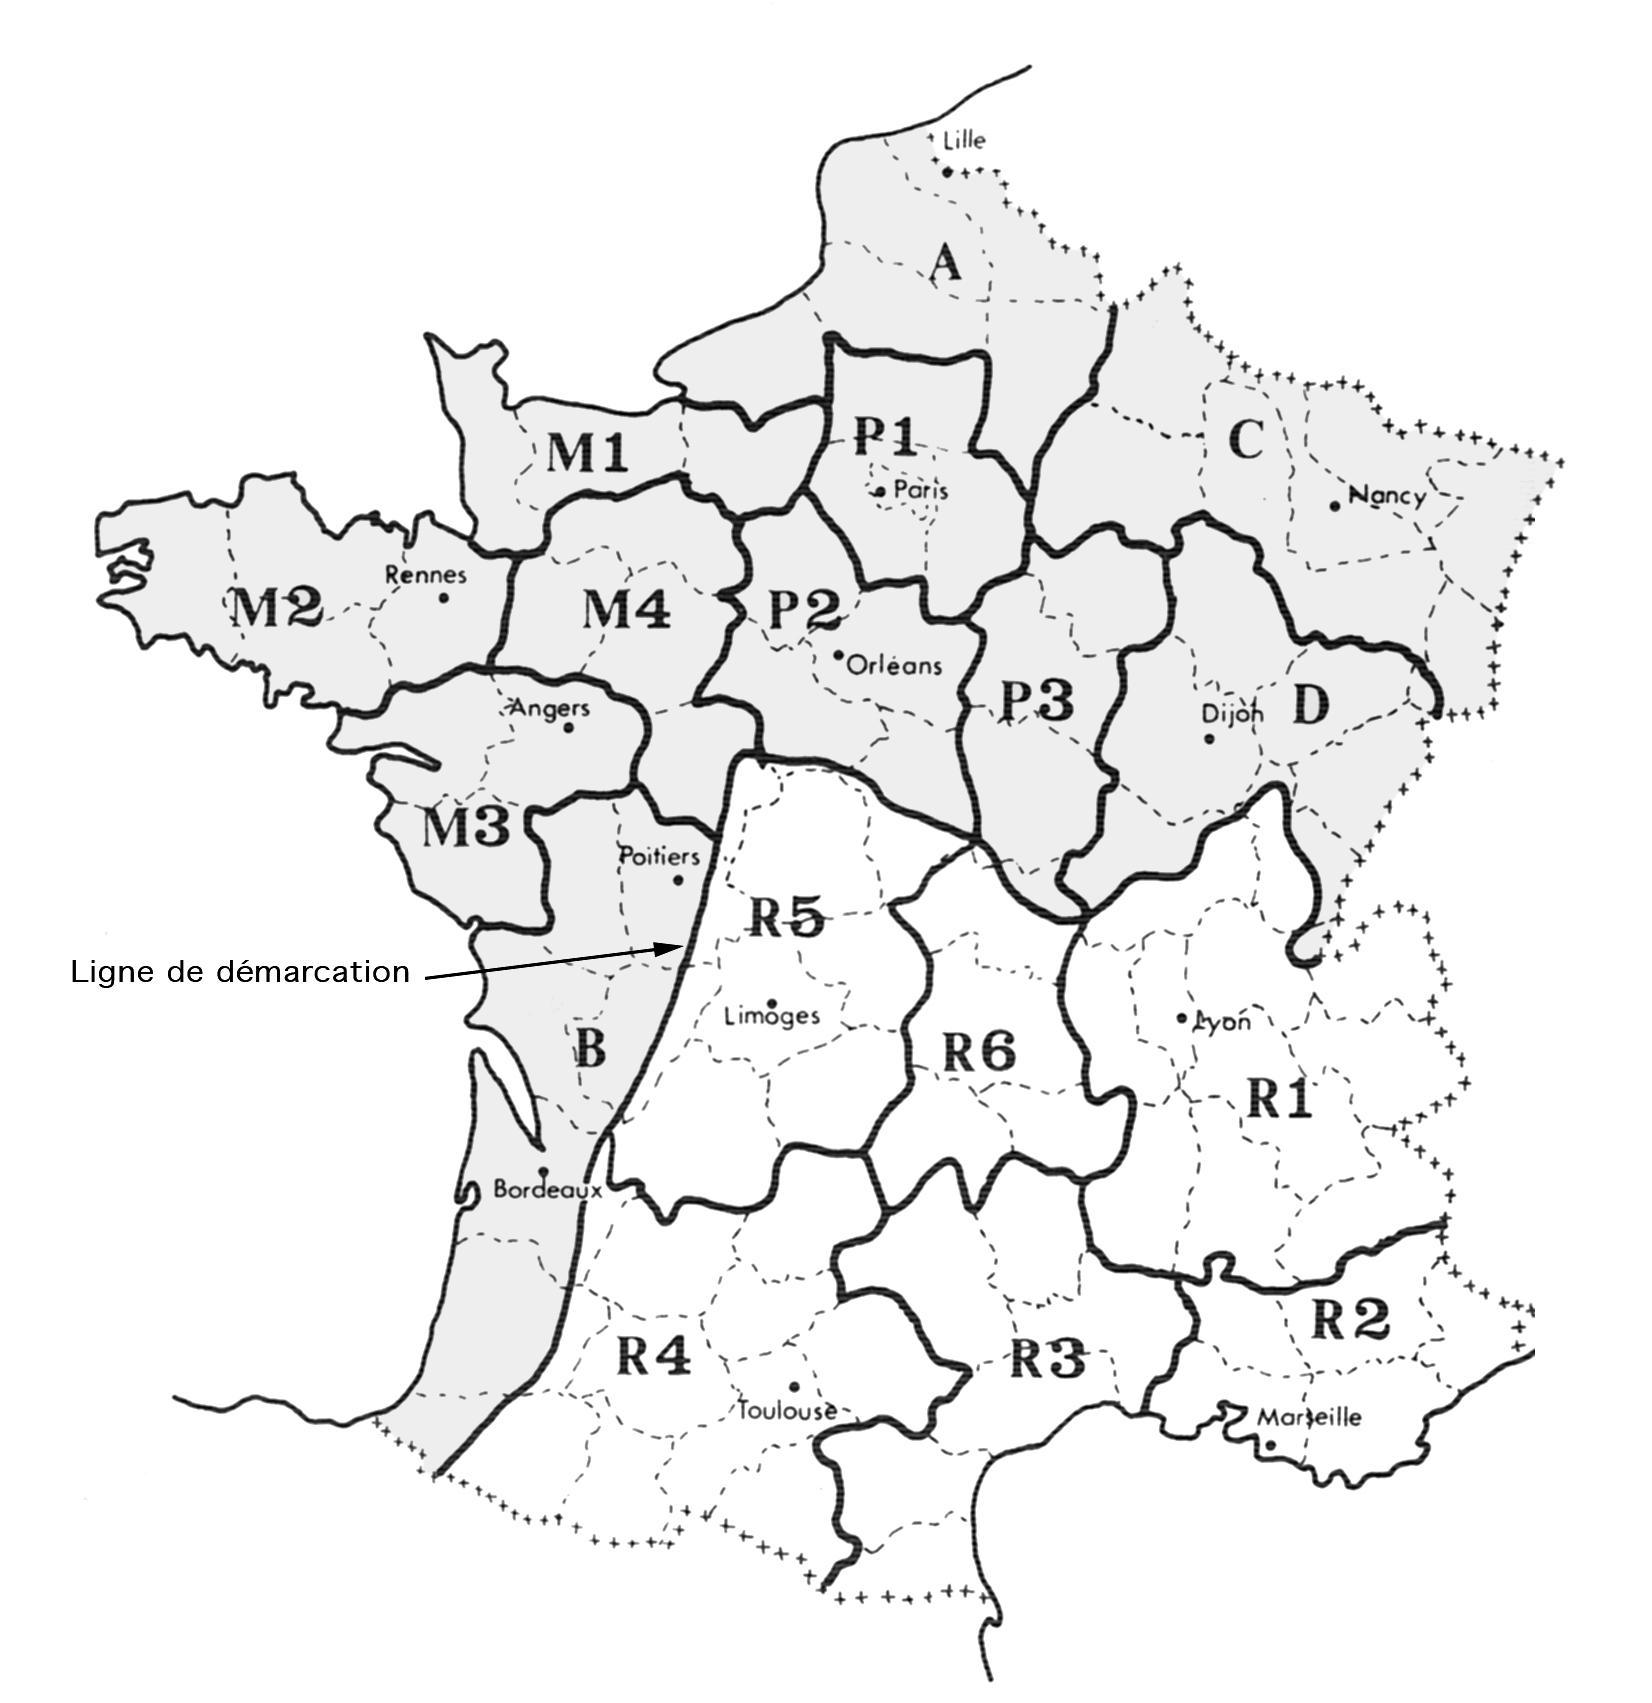 Régions_résistance.jpg